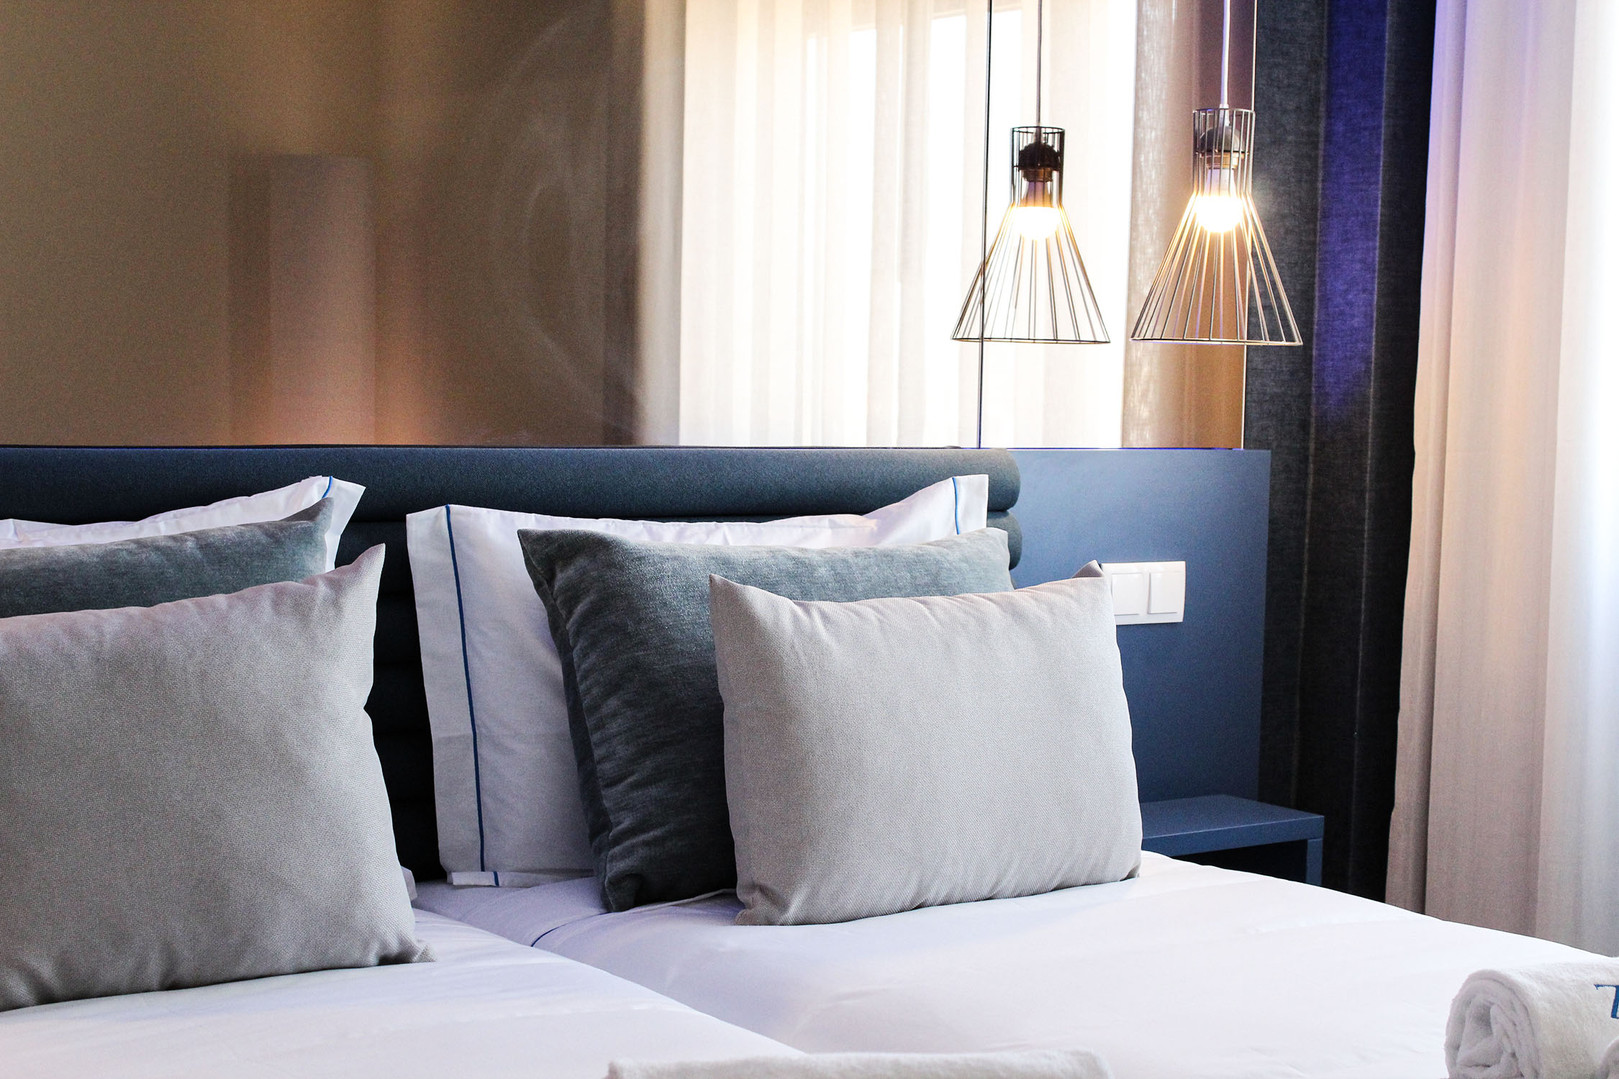 Quarto hotel 4.jpg